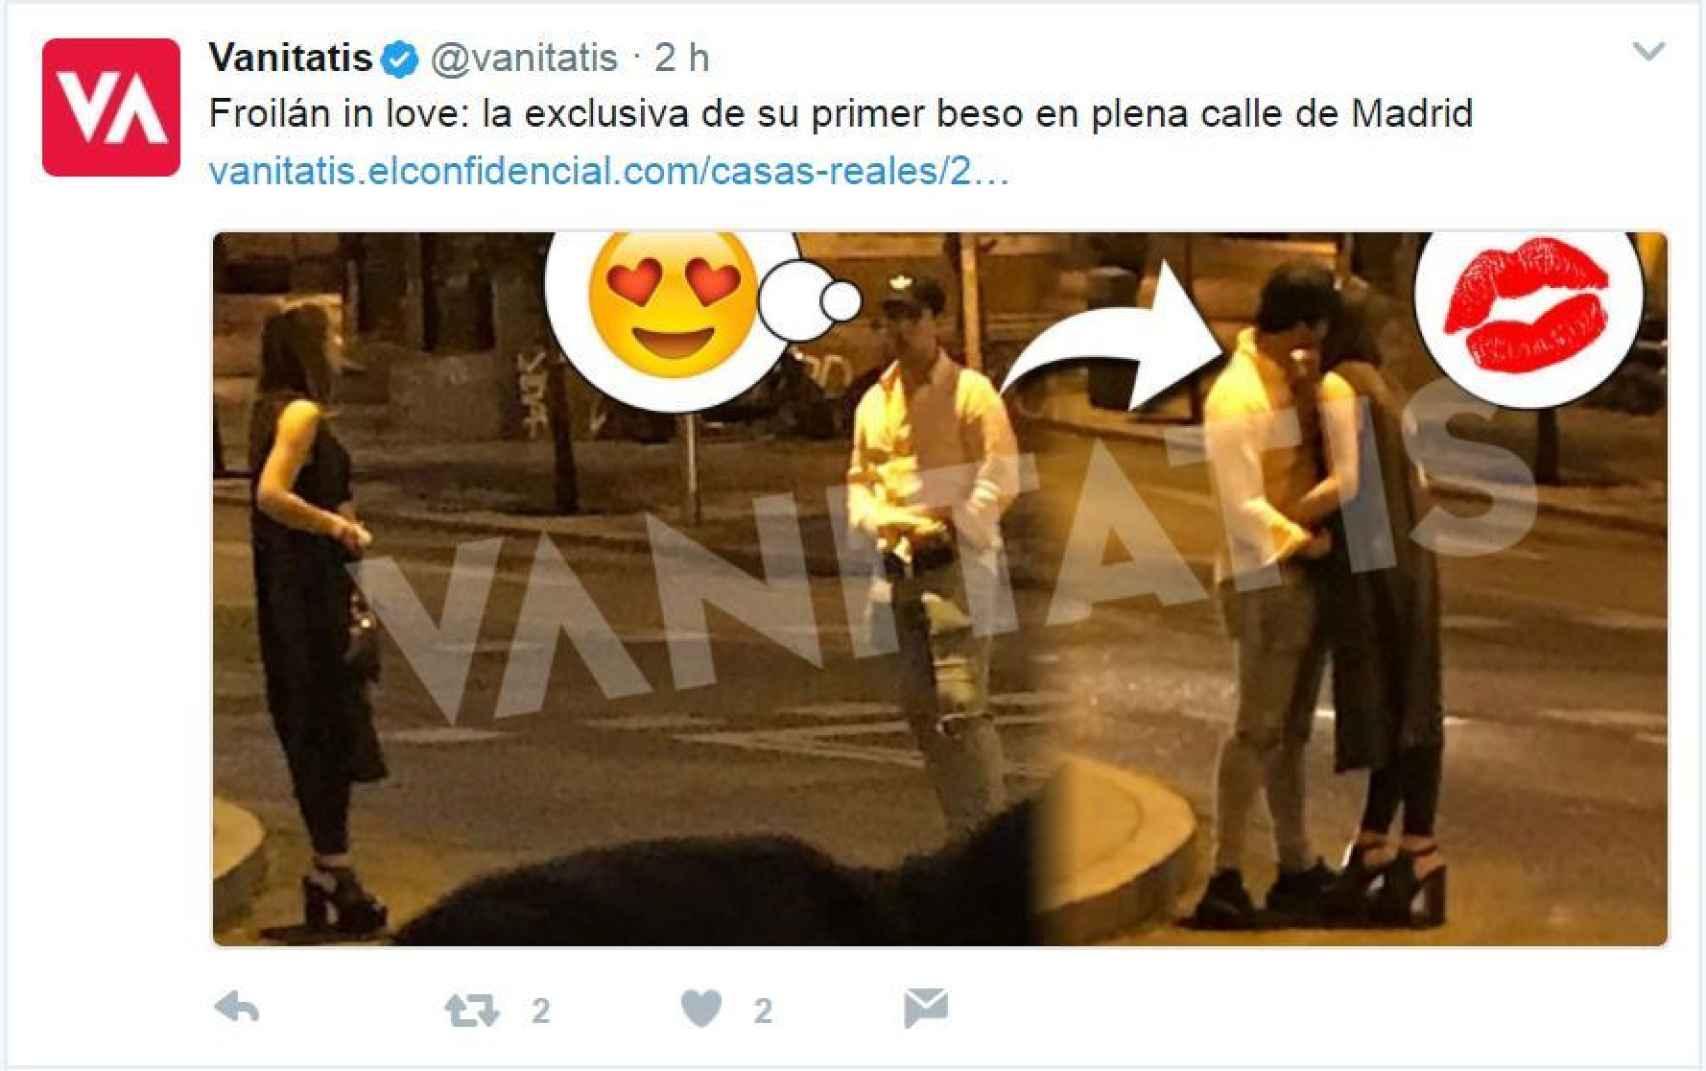 Captura del tuit de Vanitatis